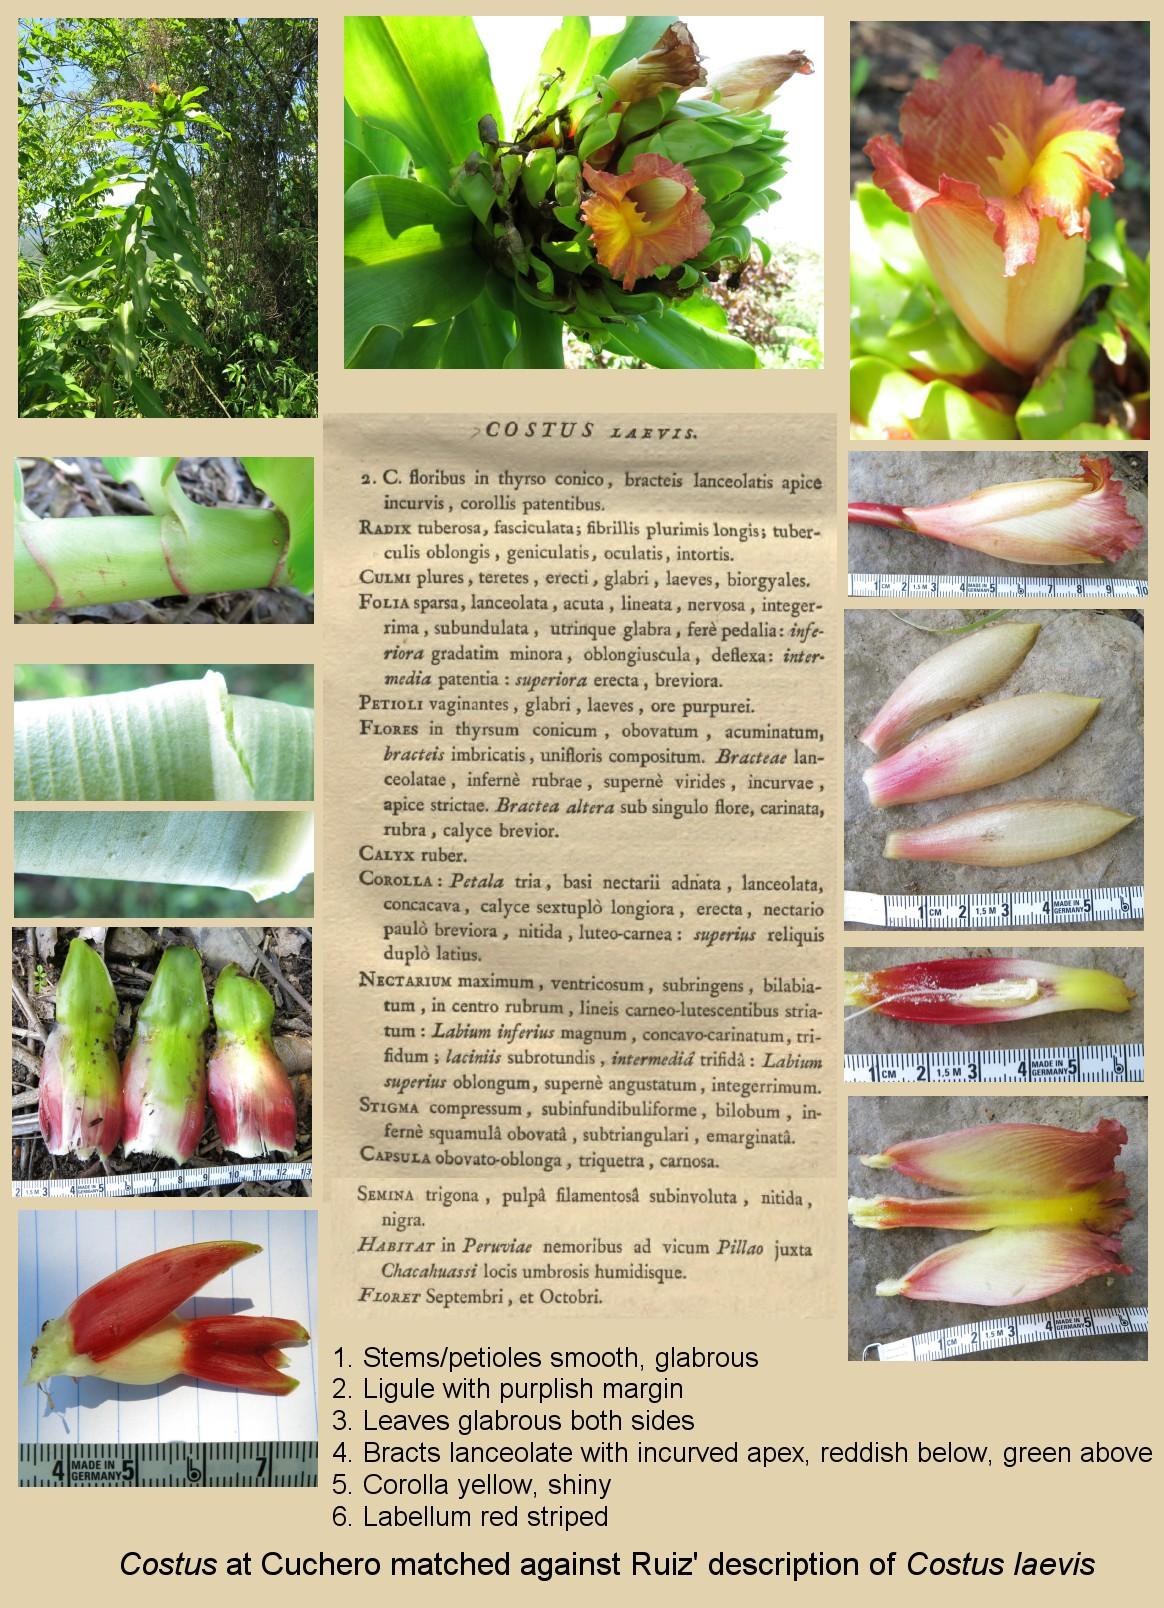 Photo# 17982 - Matching description to photos of Cuchero plant